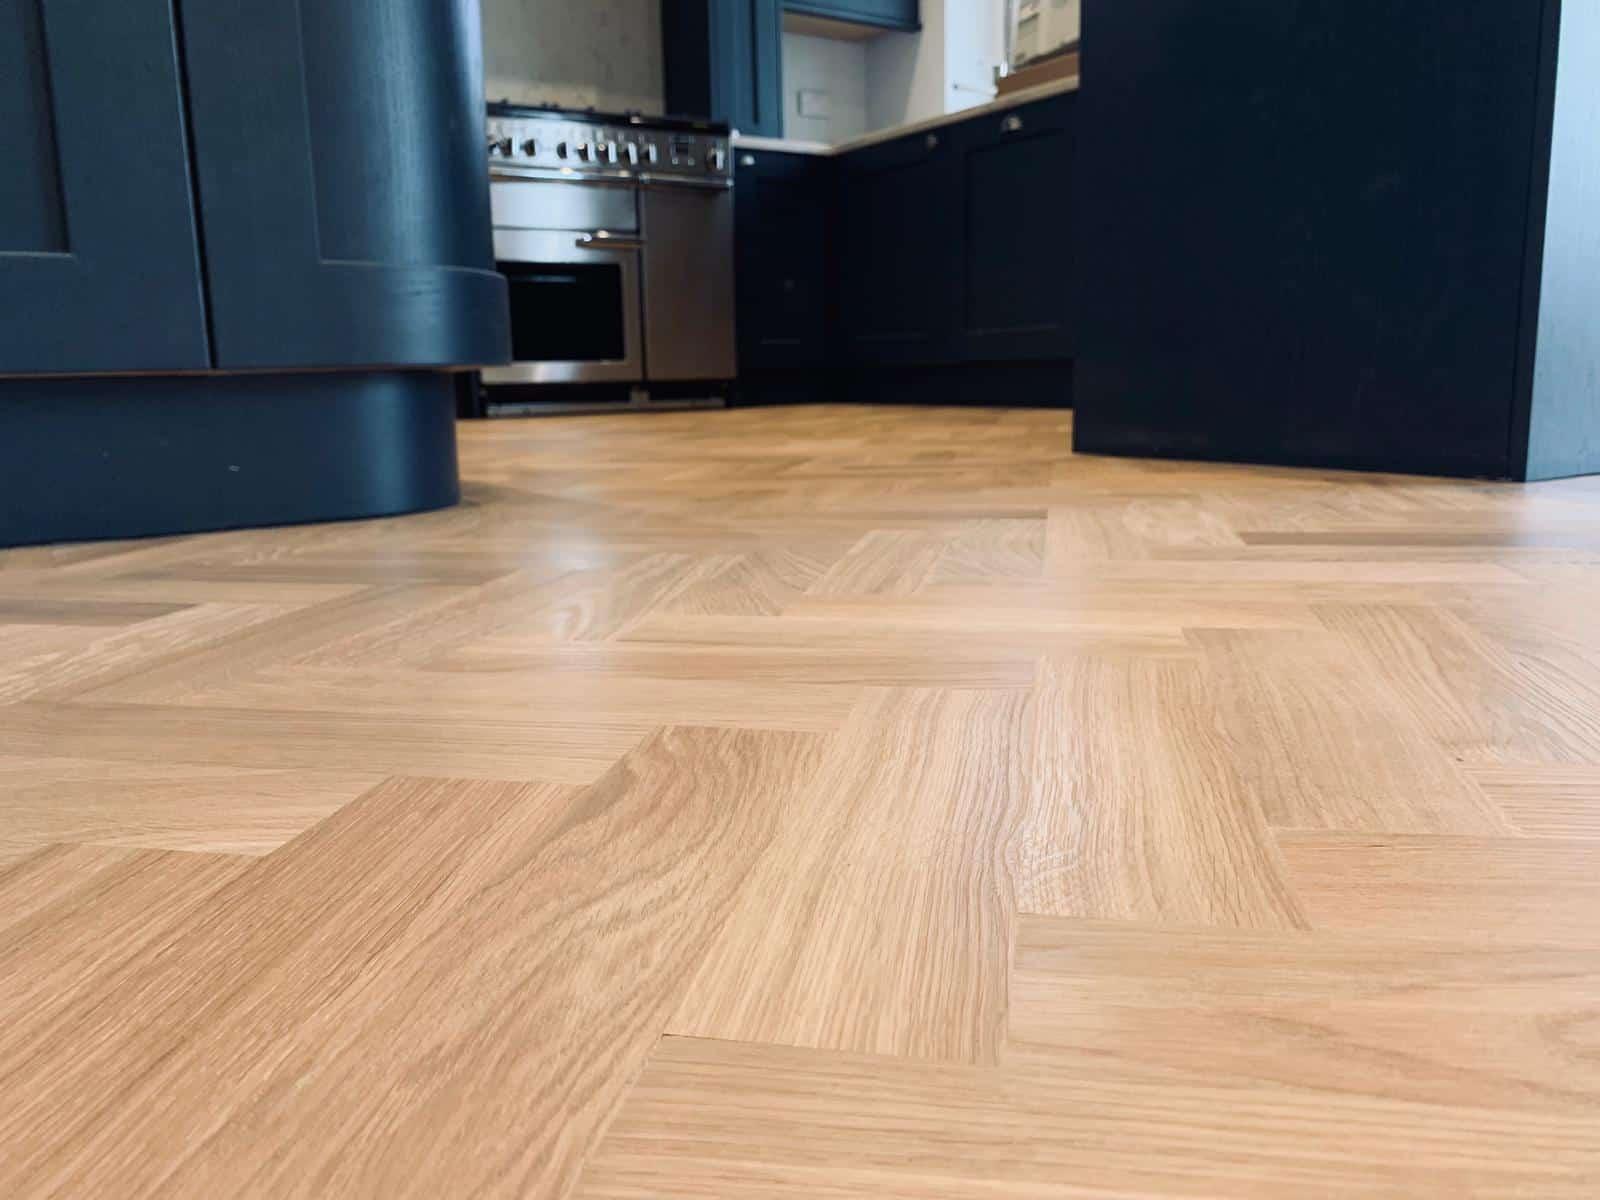 Bespoke Wood Flooring Sheffield Parquet Herringbone 3